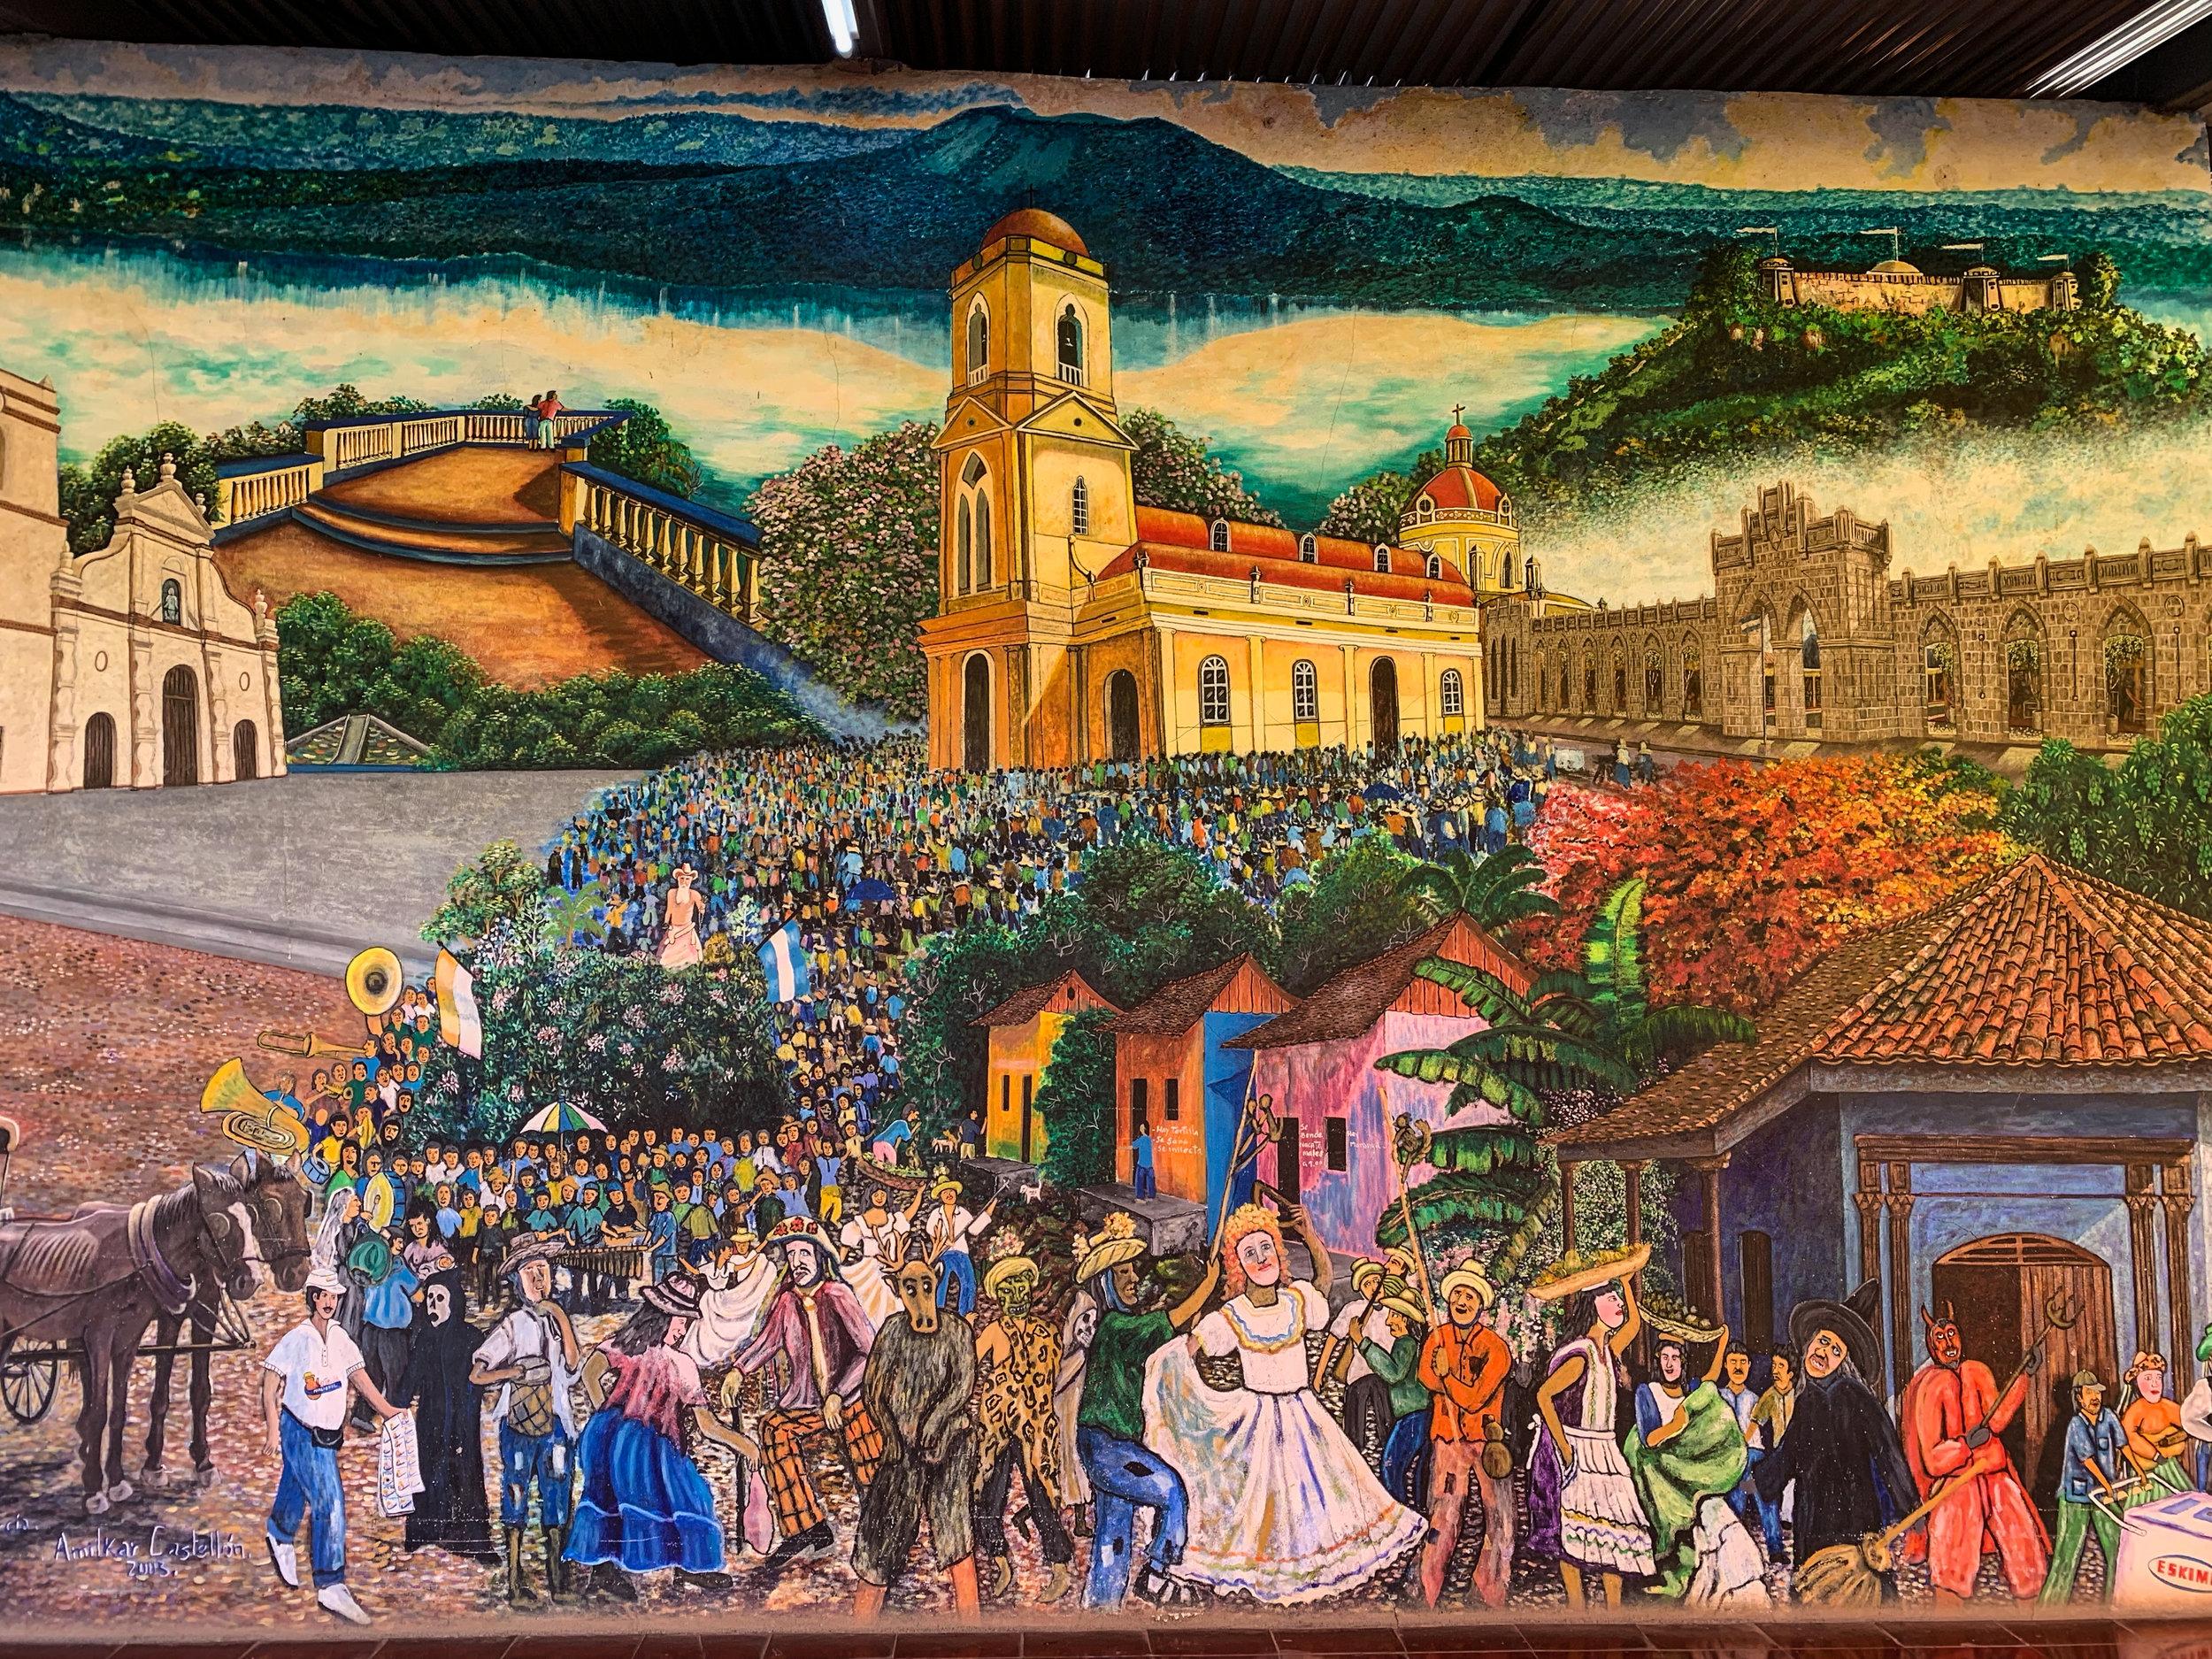 Murals in Masaya depict cultural dances and festivals